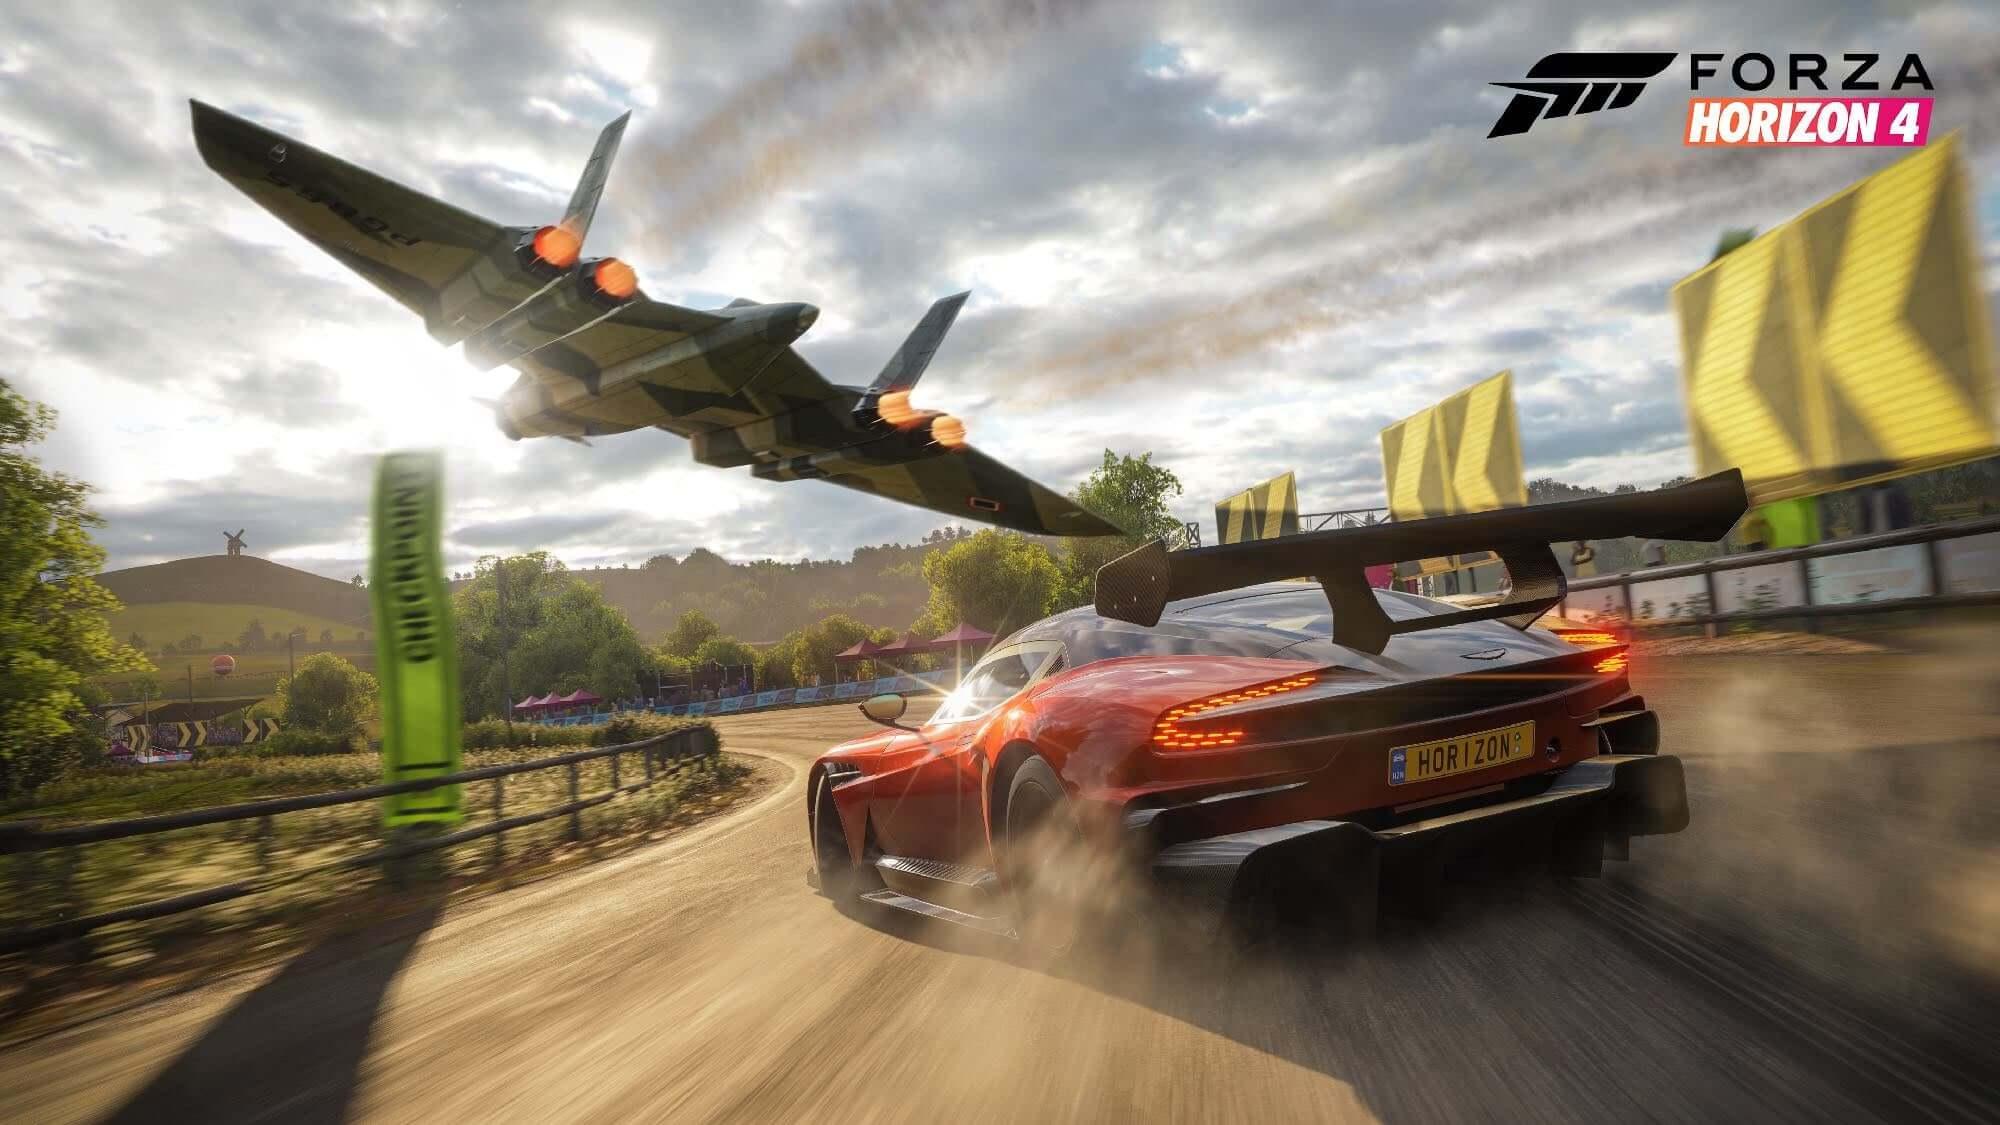 forza horizon 4 video games 2019